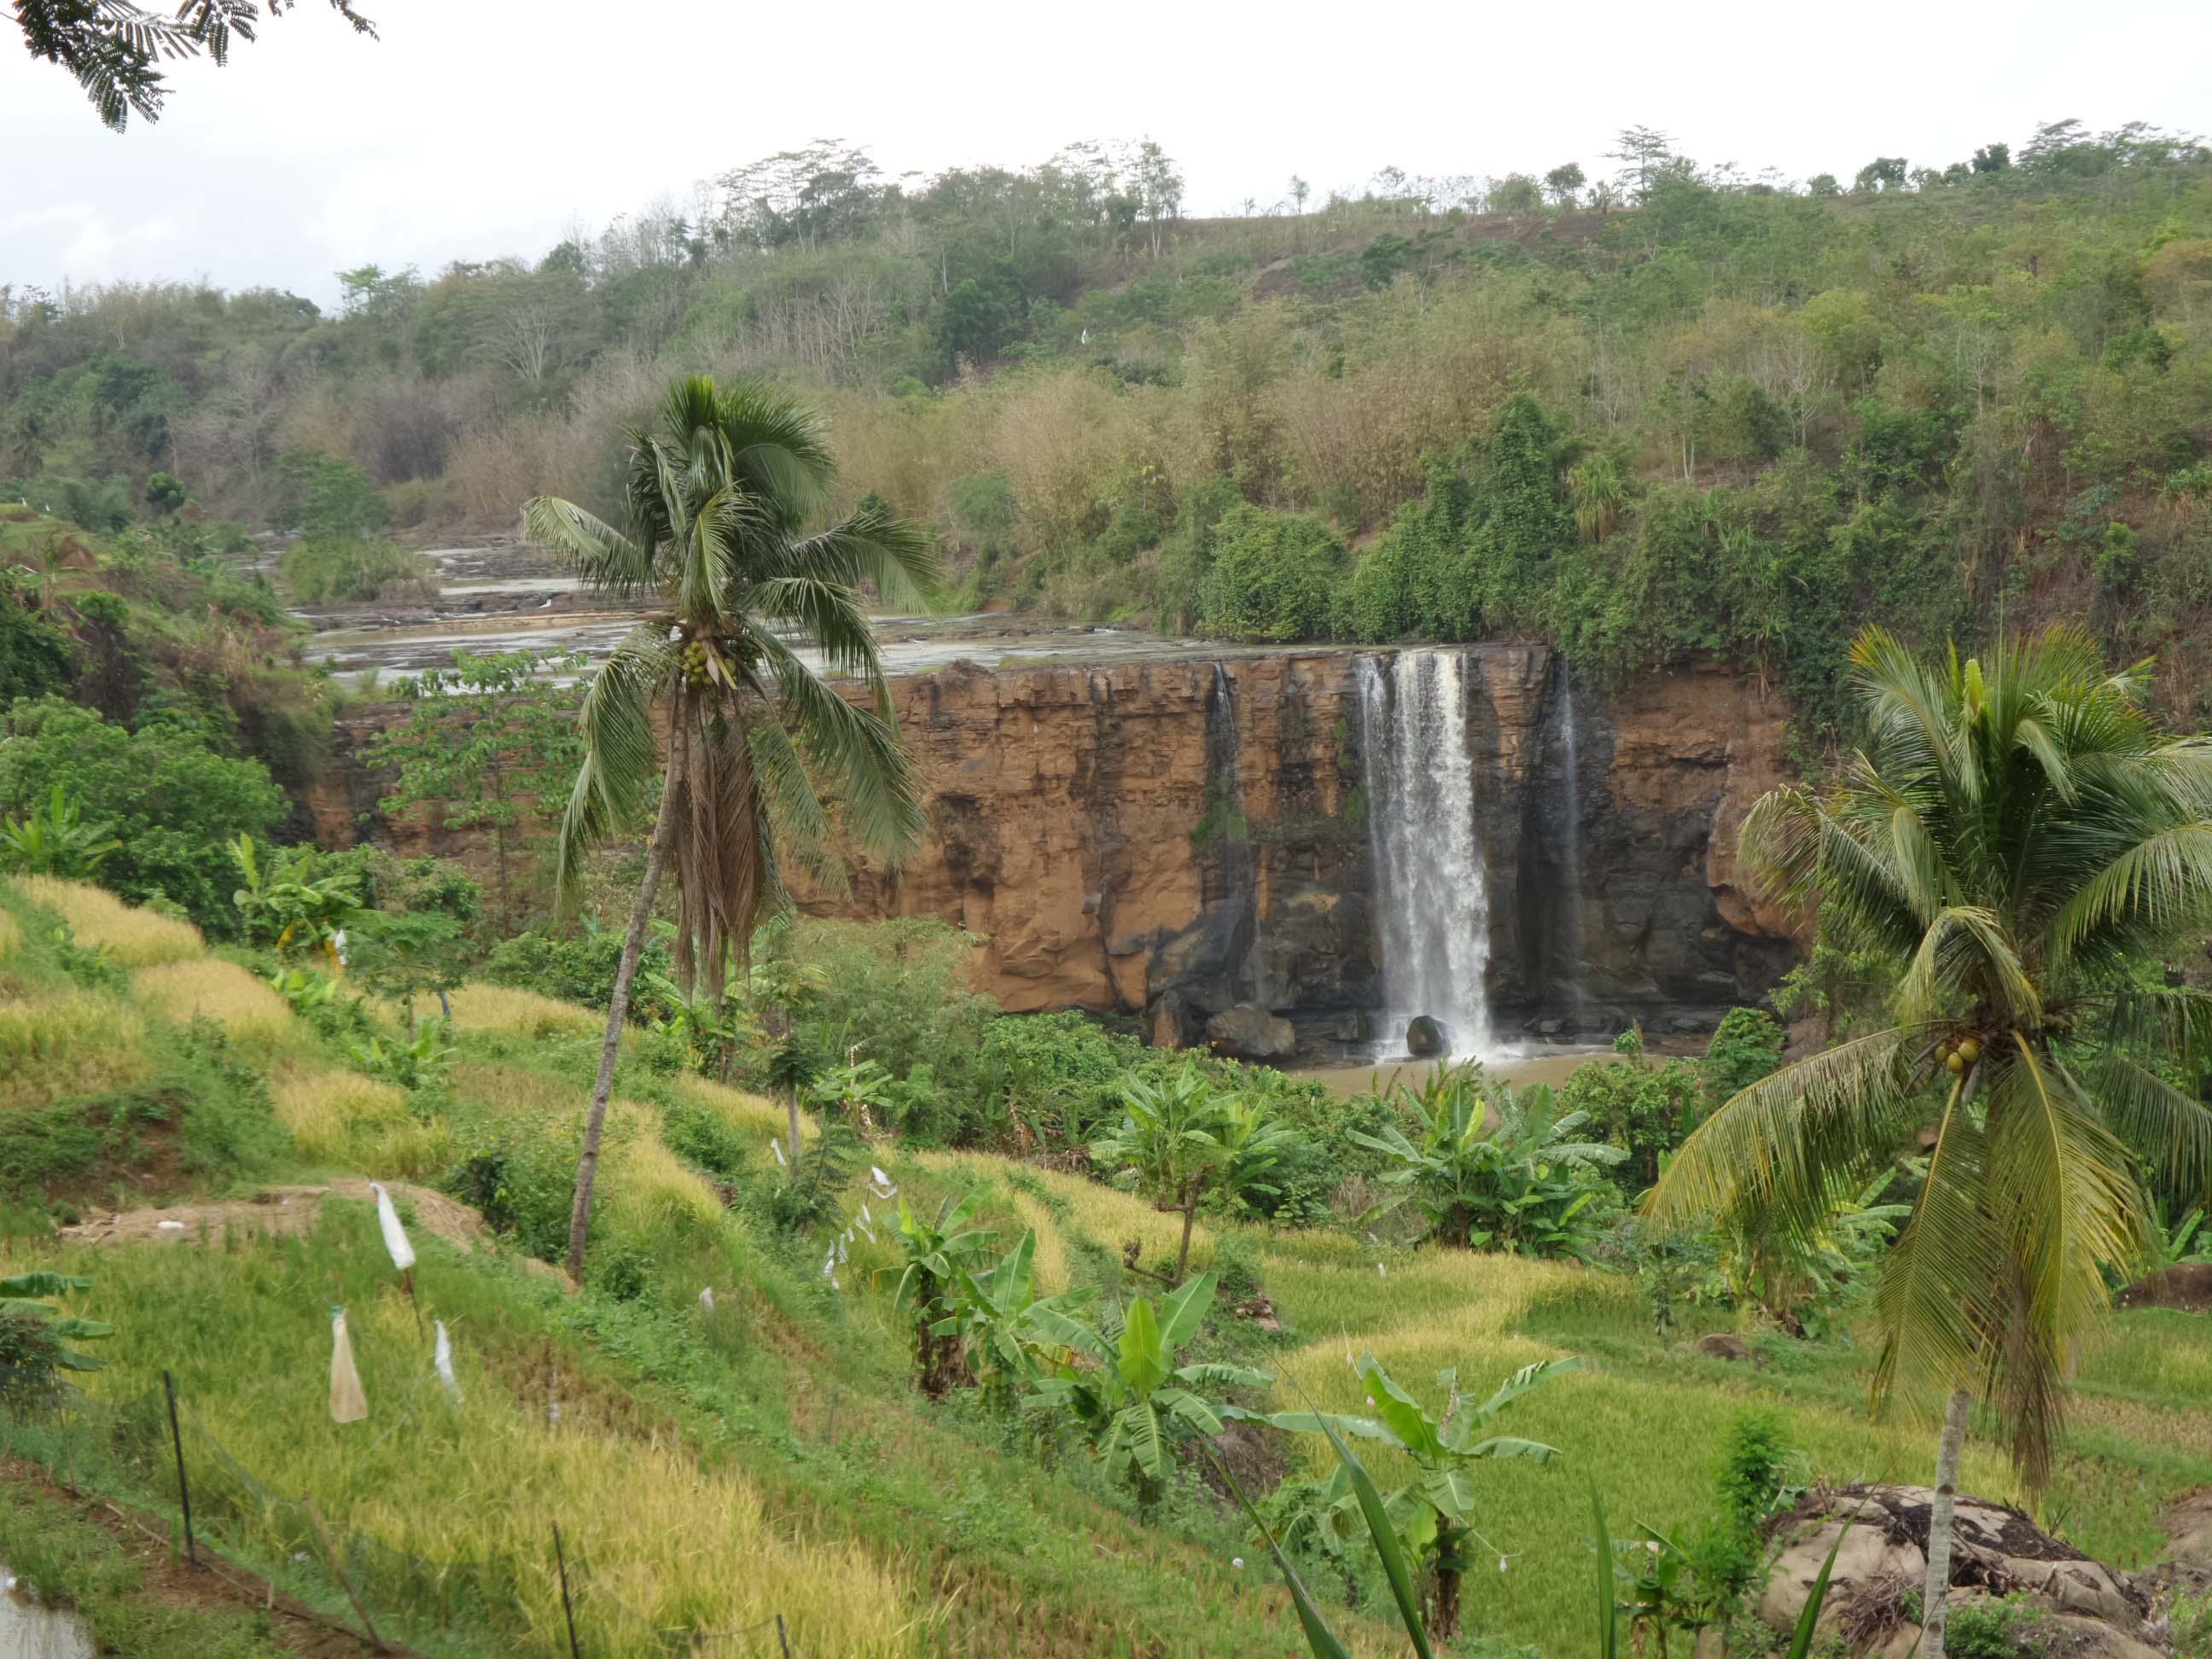 Danau Bacan jadi tempat wisata di sukabumi terbaru